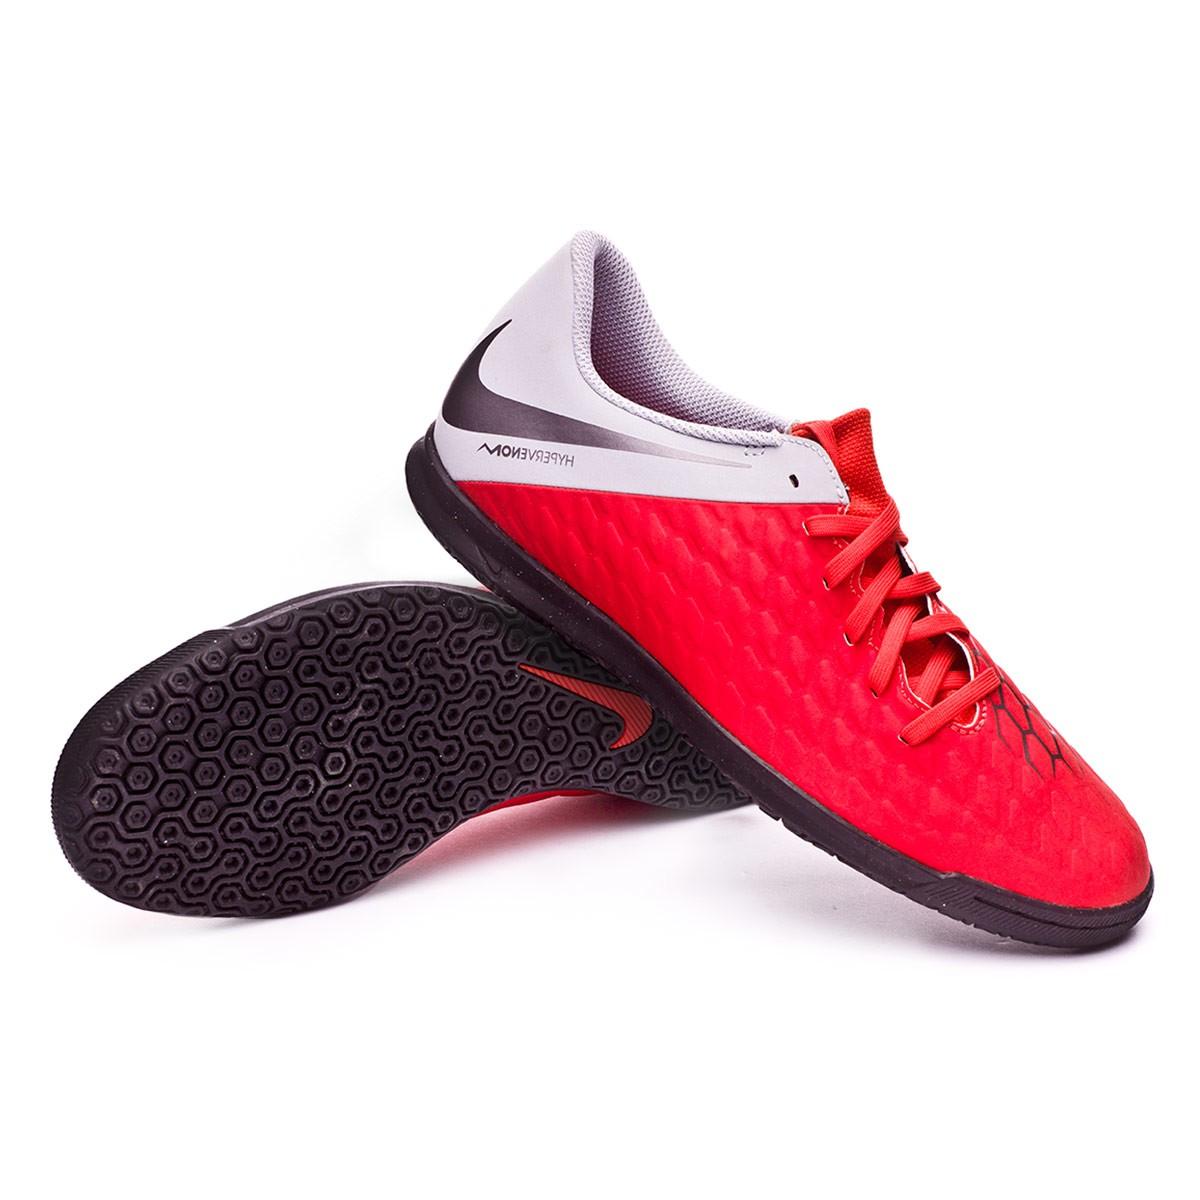 31d5d9ead16 Futsal Boot Nike Hypervenom PhantomX III Club IC Light crimson ...